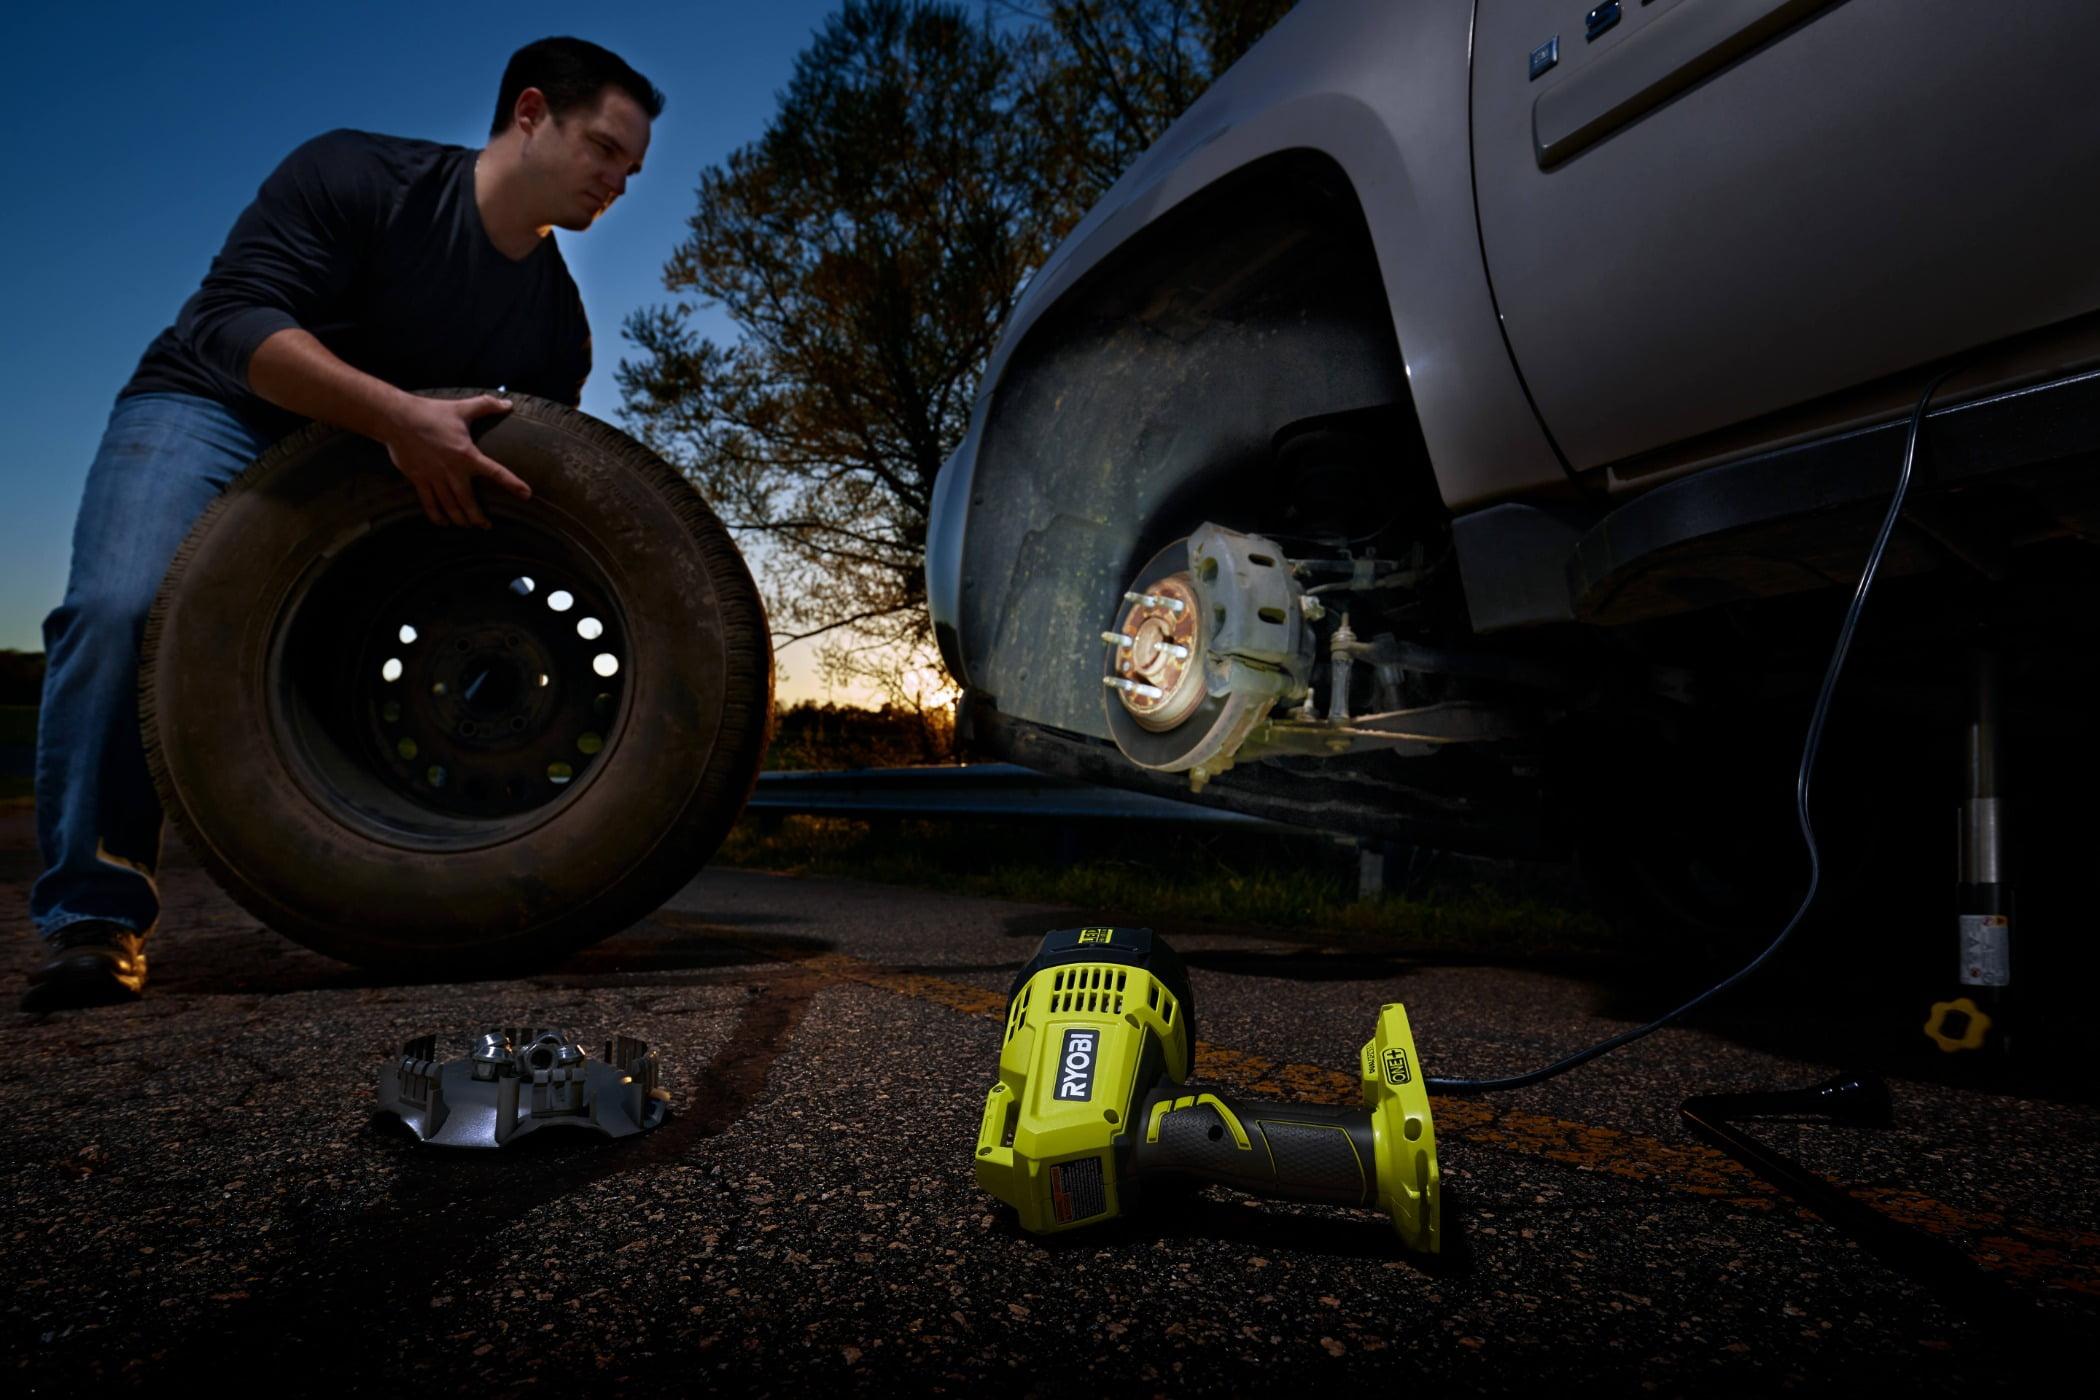 Automotive tire, Motor vehicle, Synthetic rubber, Wheel, Sky, Tread